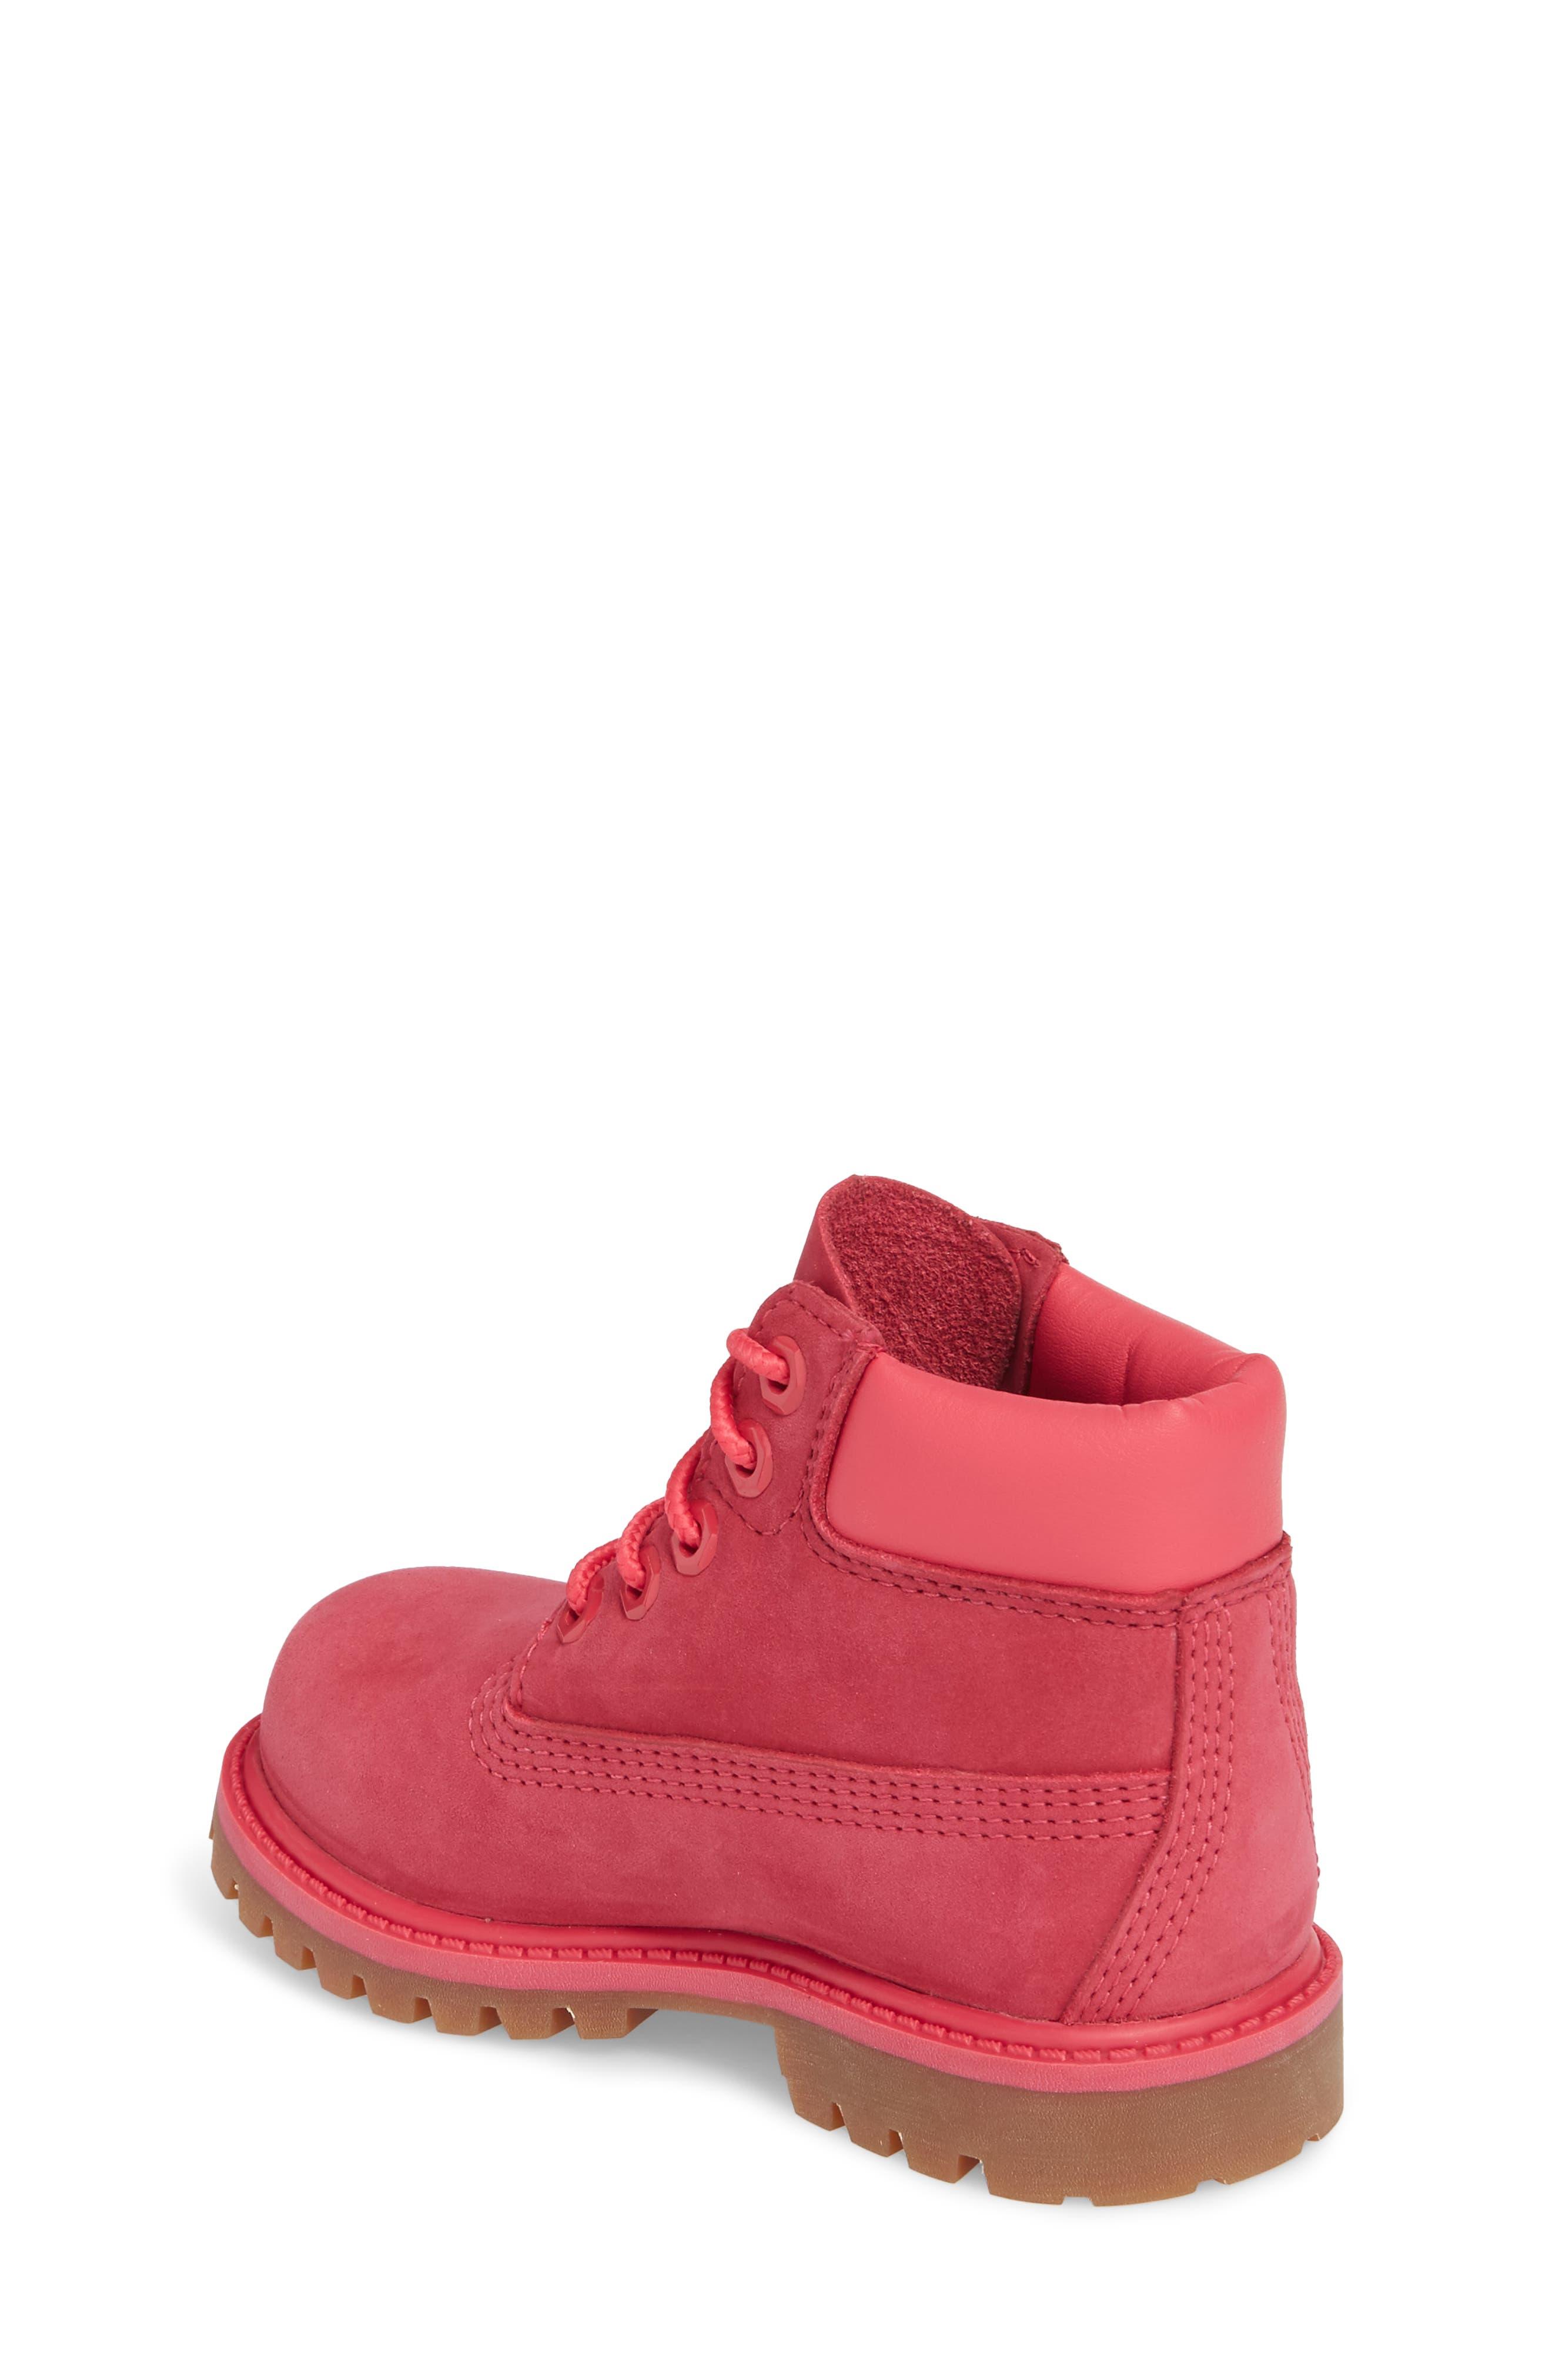 Alternate Image 2  - Timberland 6-Inch Premium Waterproof Boot (Walker, Toddler, Little Kid & Big Kid)